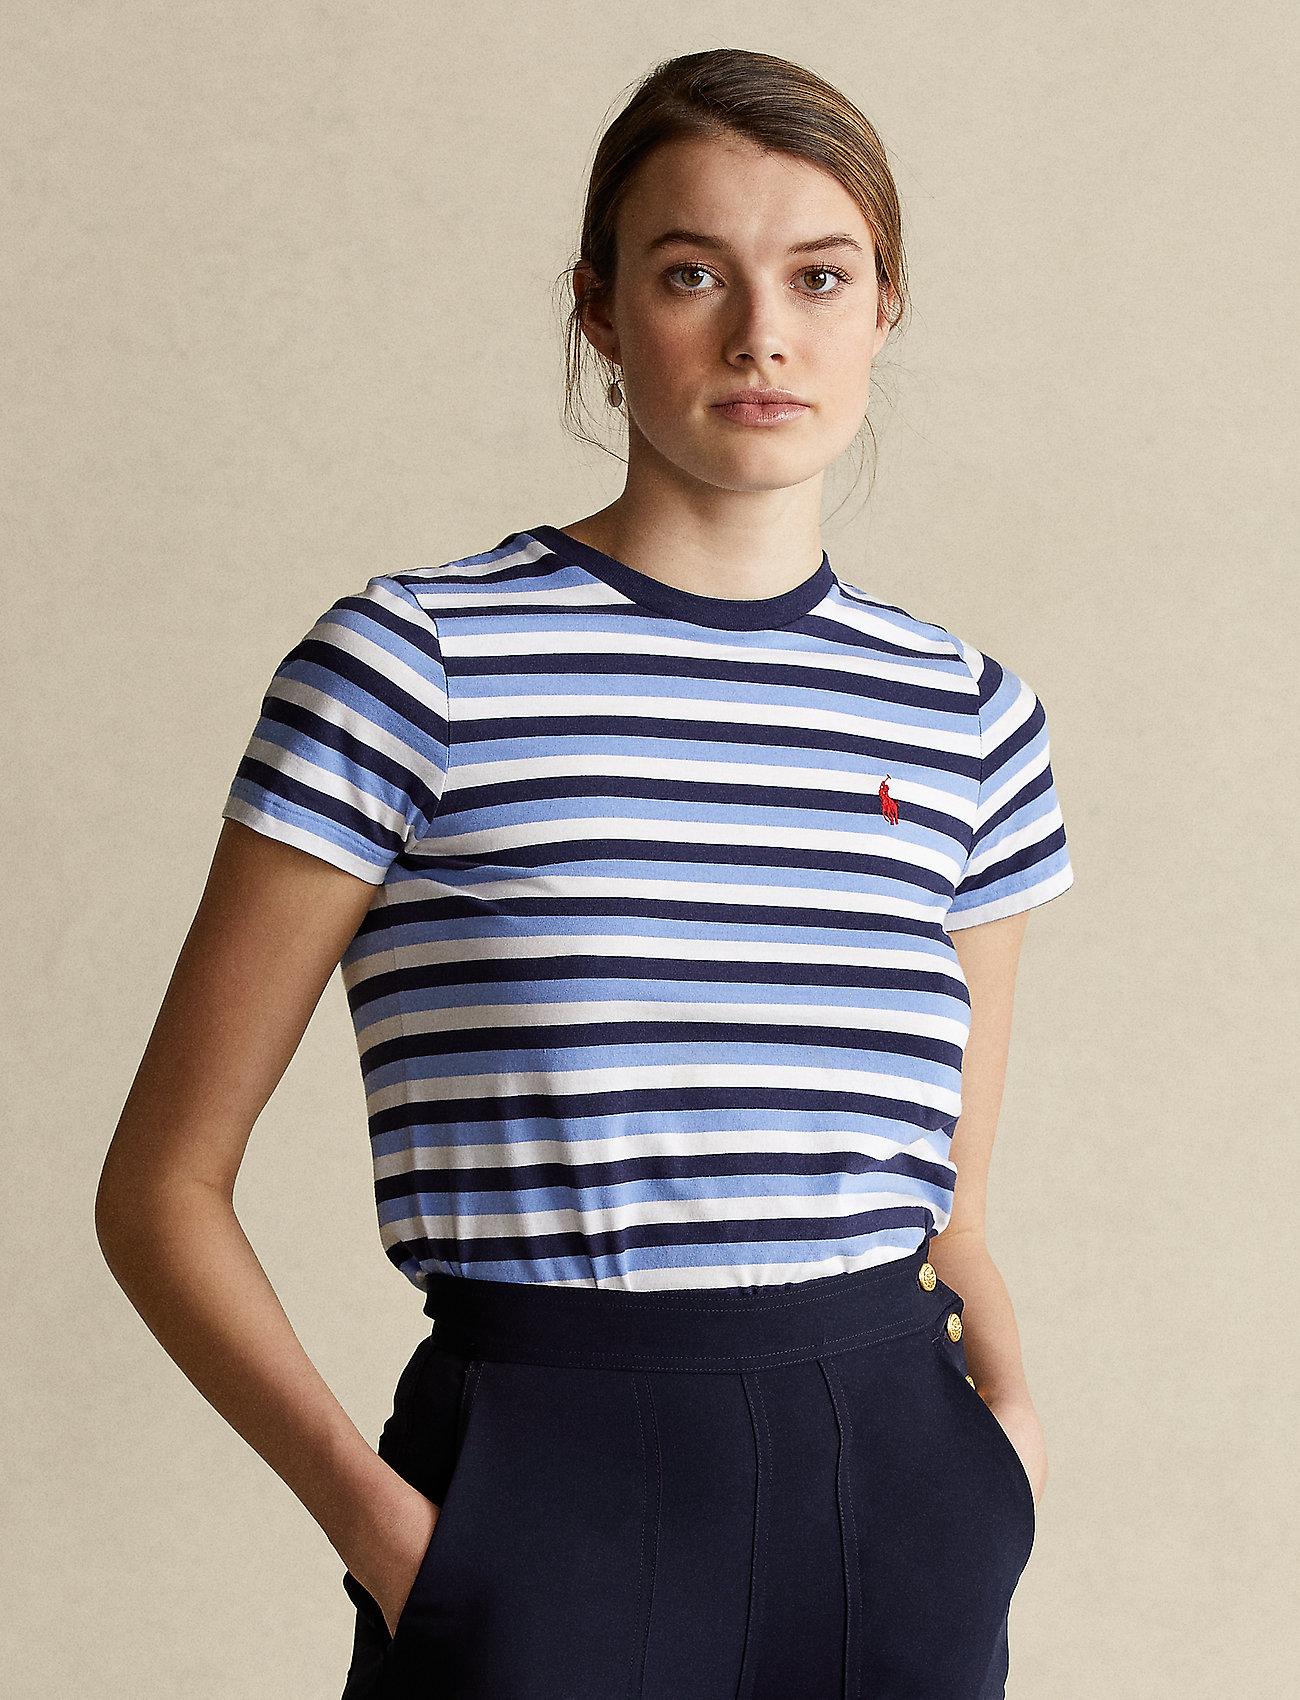 Polo Ralph Lauren - Striped Cotton Tee - t-shirts - blue/navy/white - 0